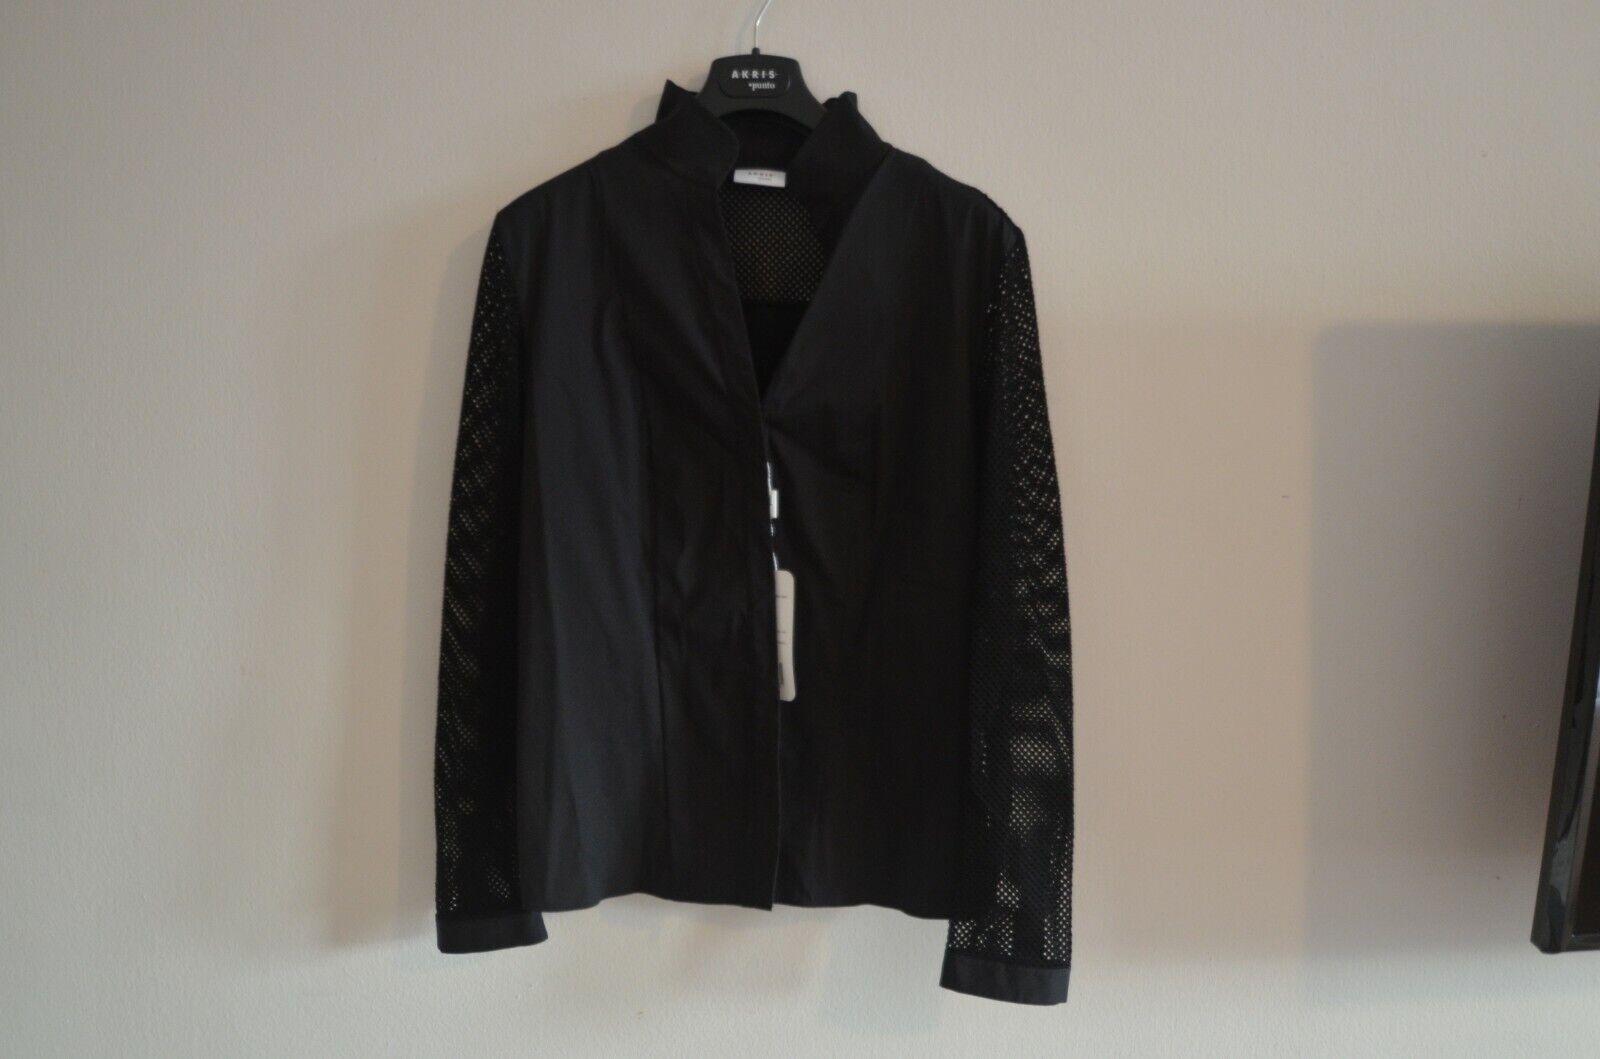 New AKRIS Punto Woherren Blouse Shirt Top schwarz Long Sleeves Retail  NWT 10